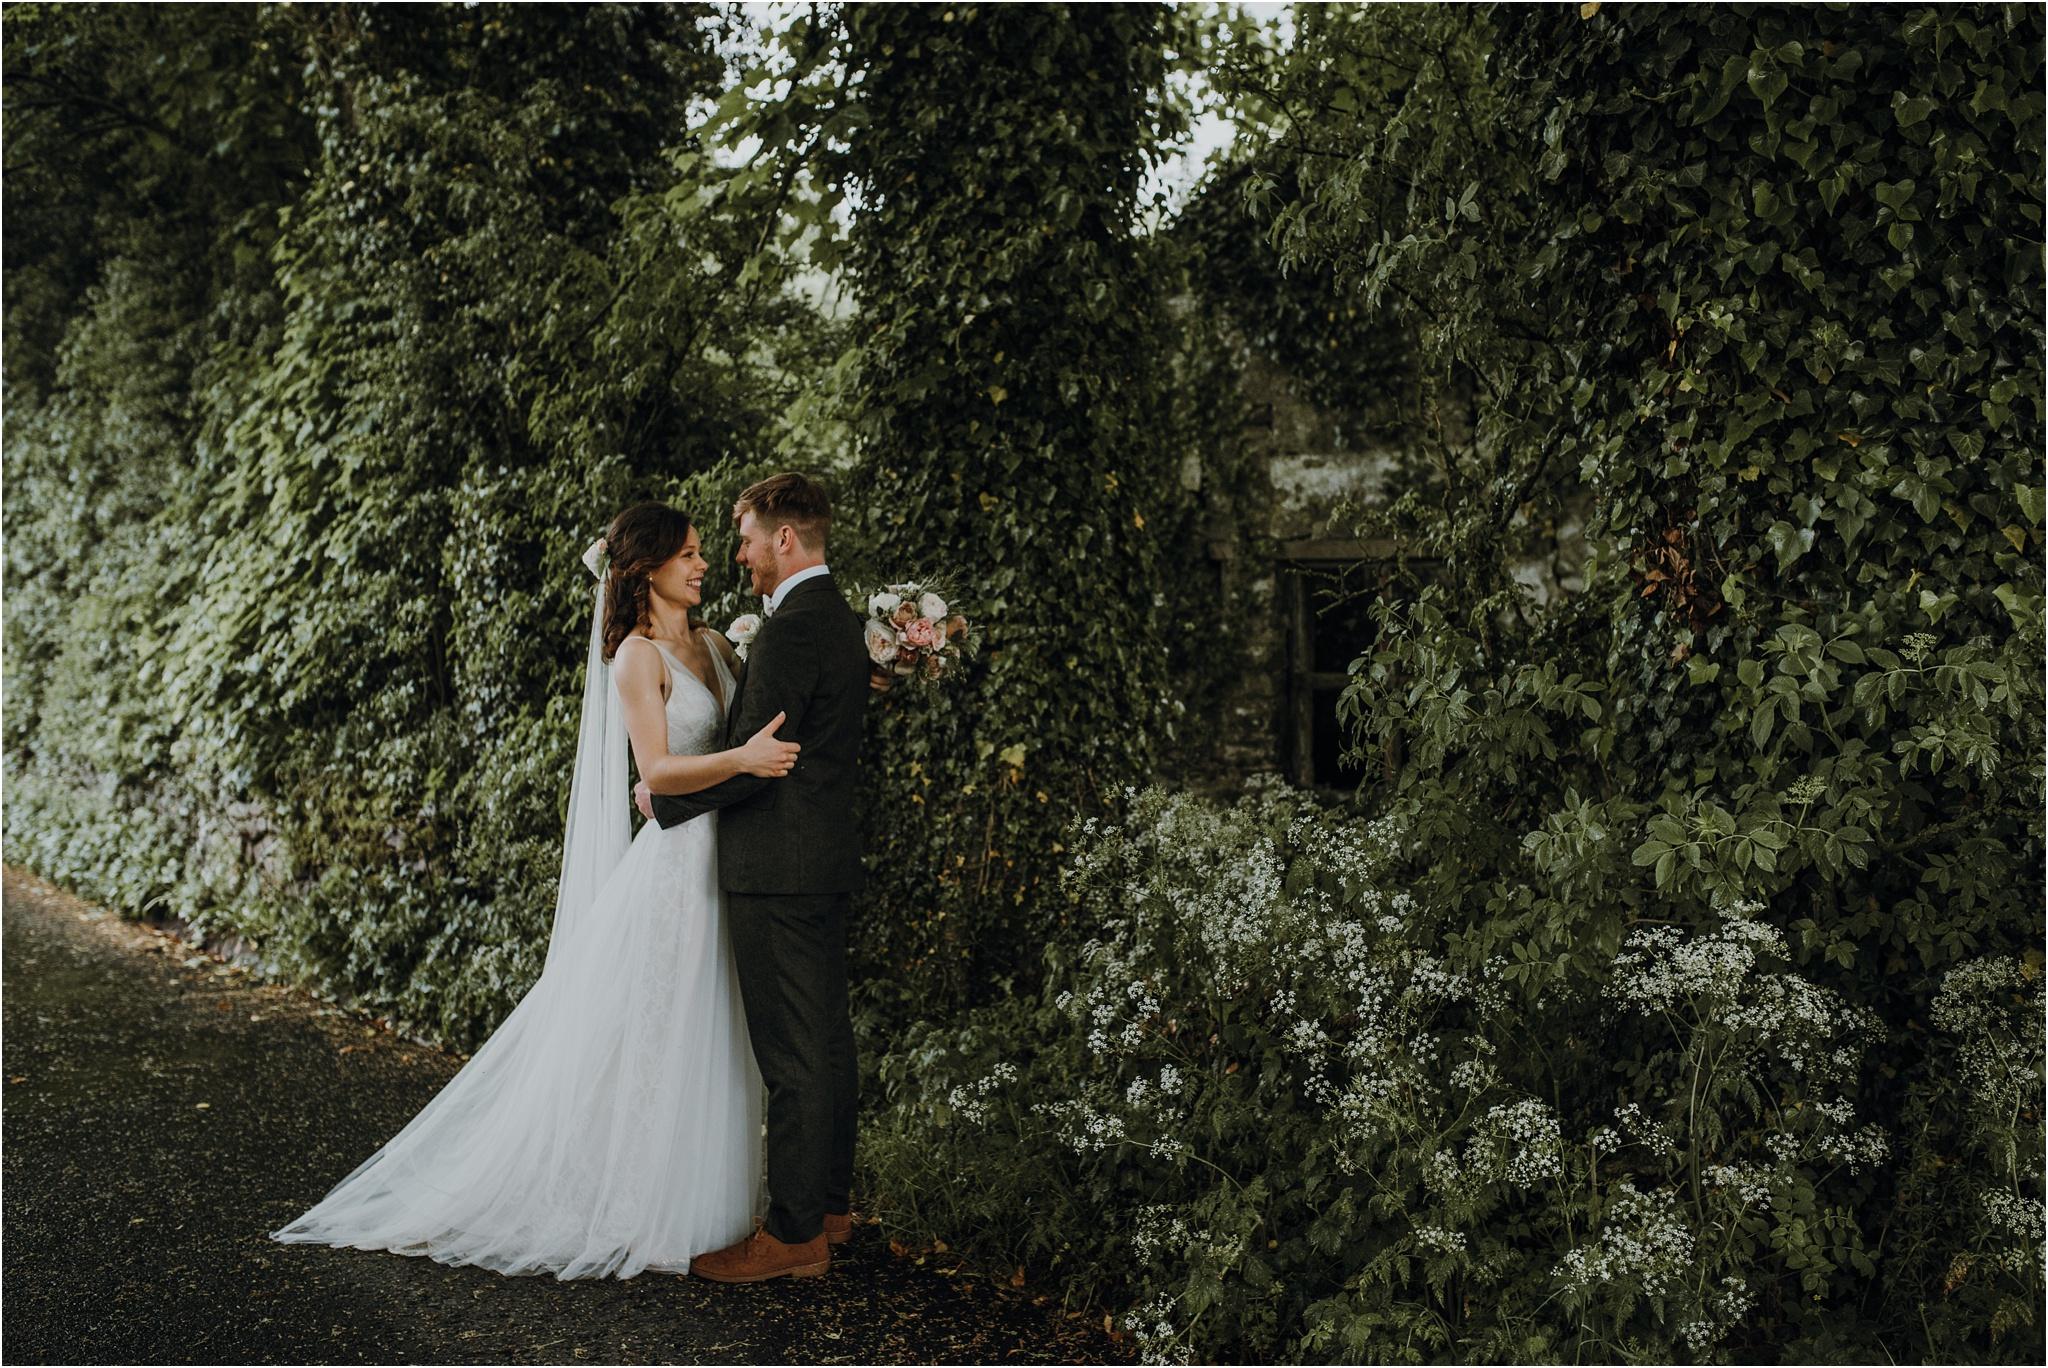 Outdoor-country-wedding-Edinburgh-photographer__0203.jpg